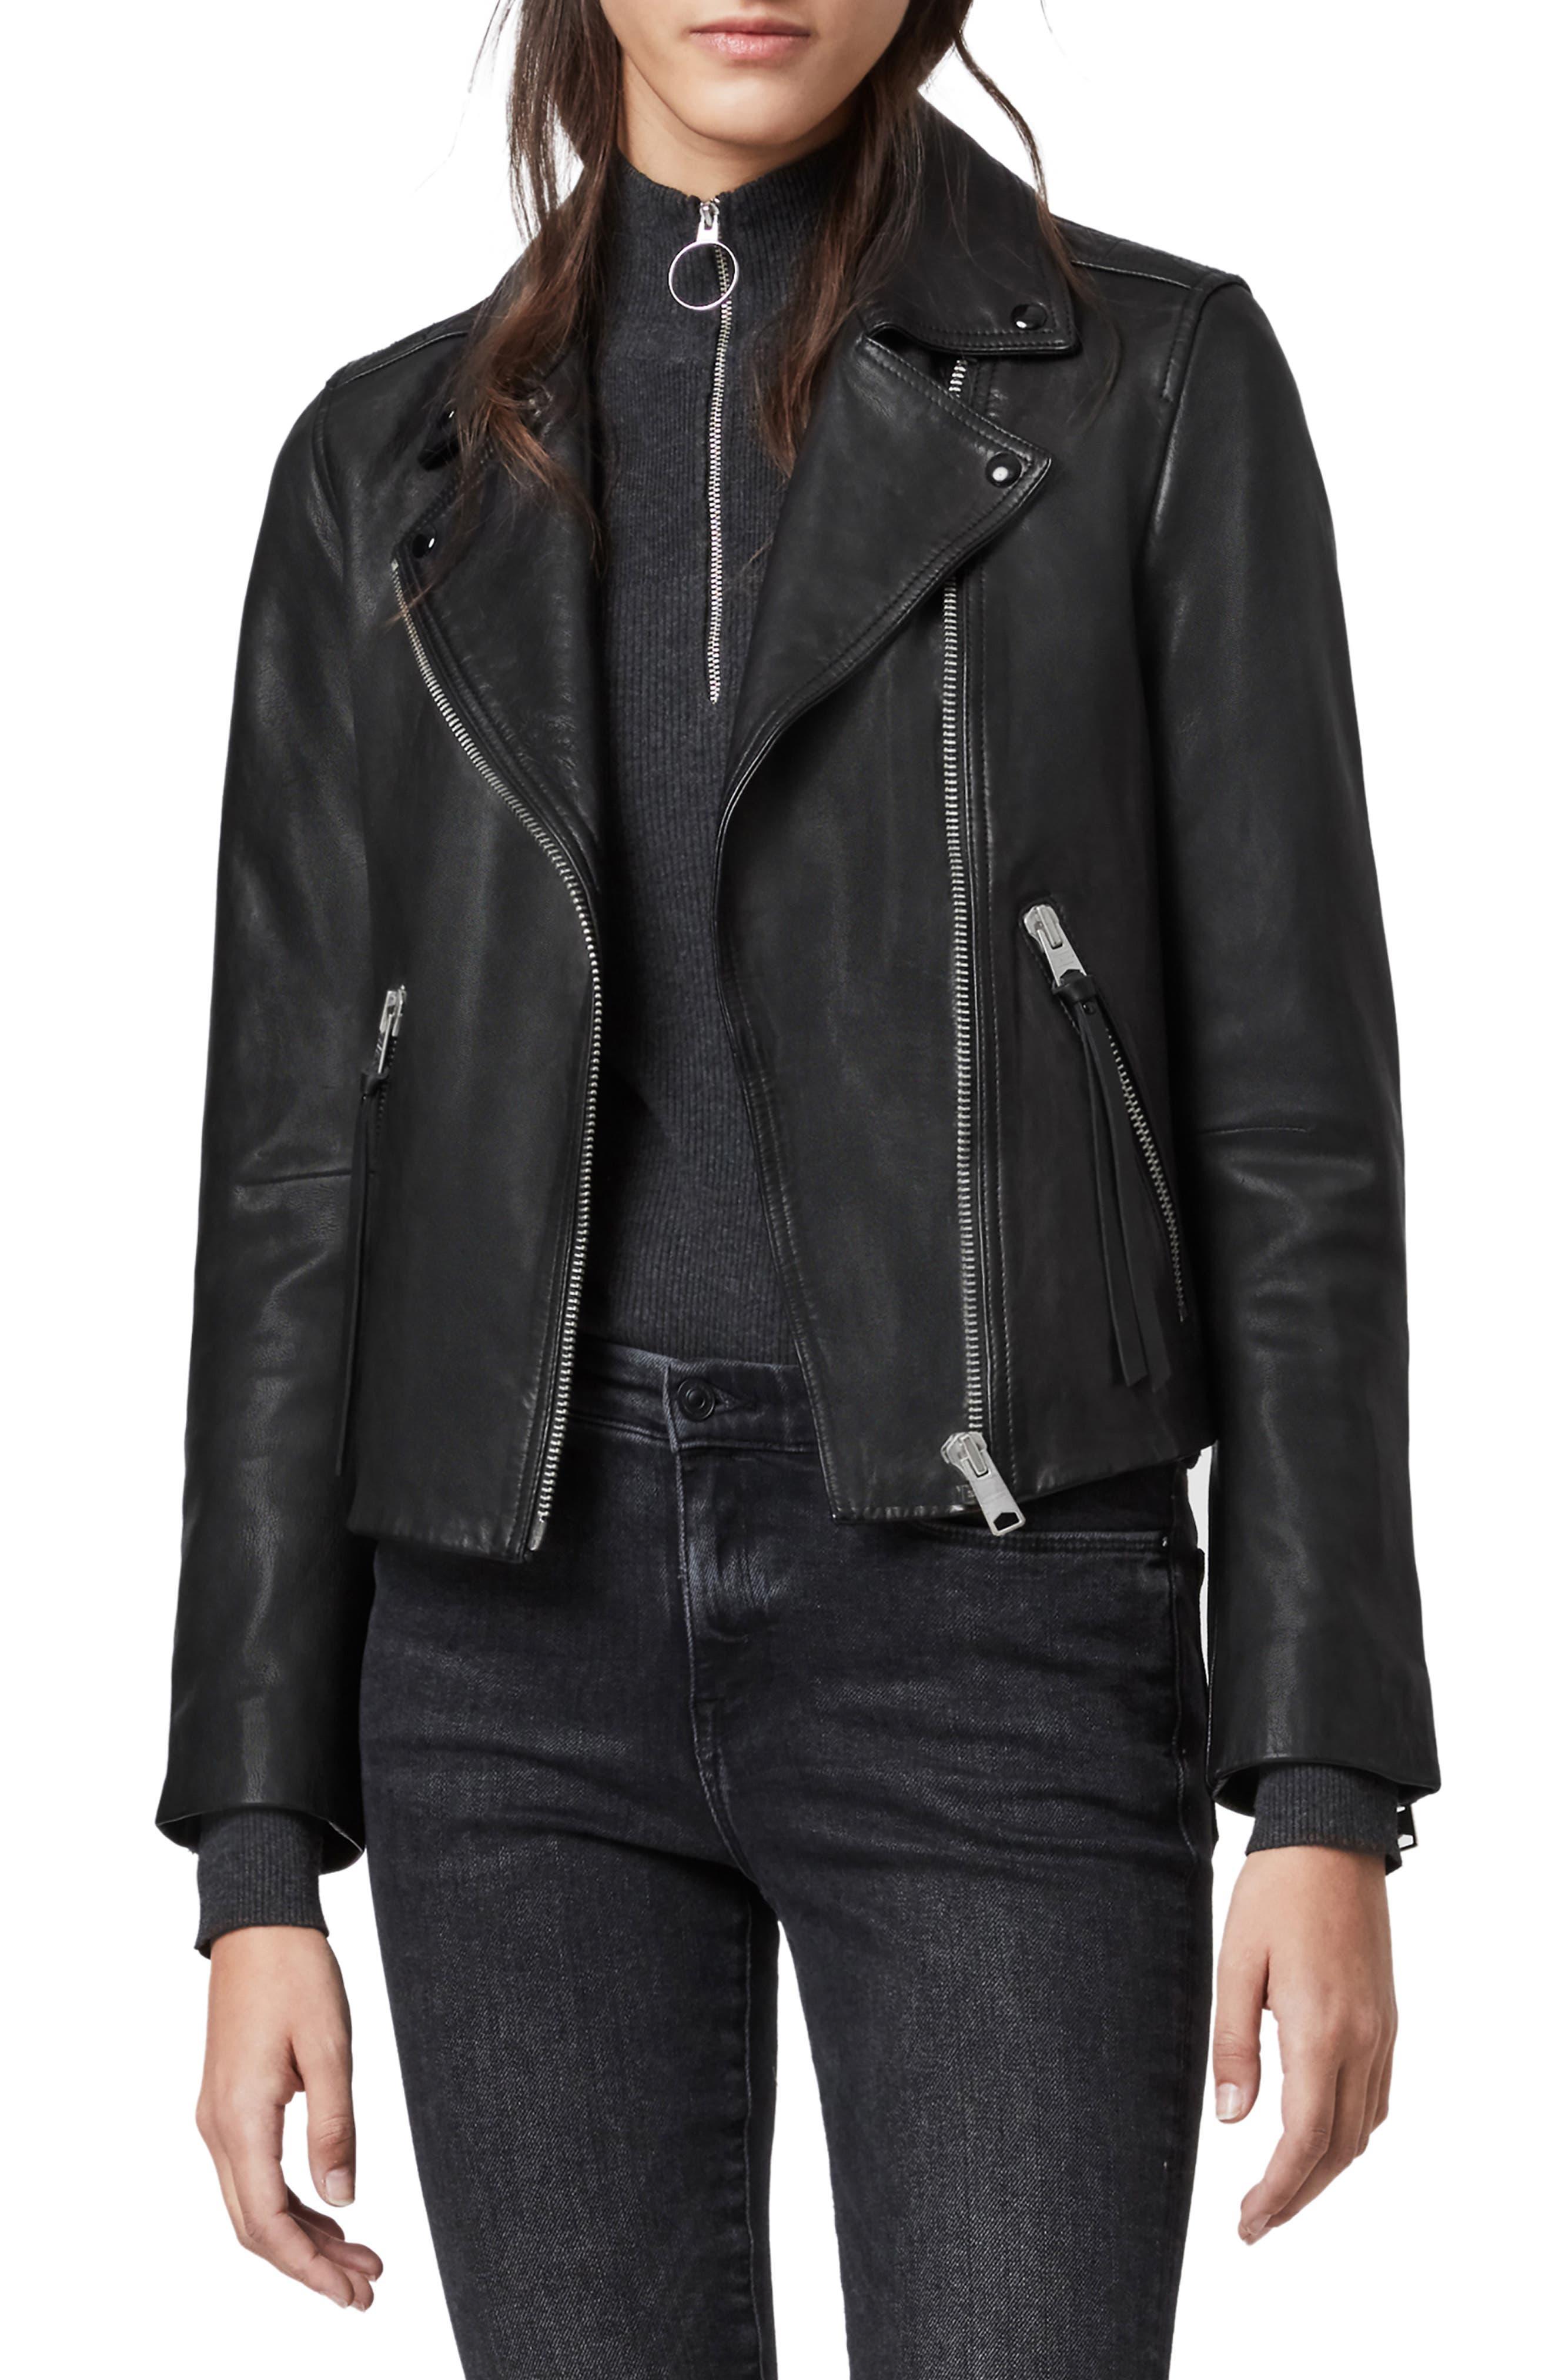 women's genuine leather coats & jackets